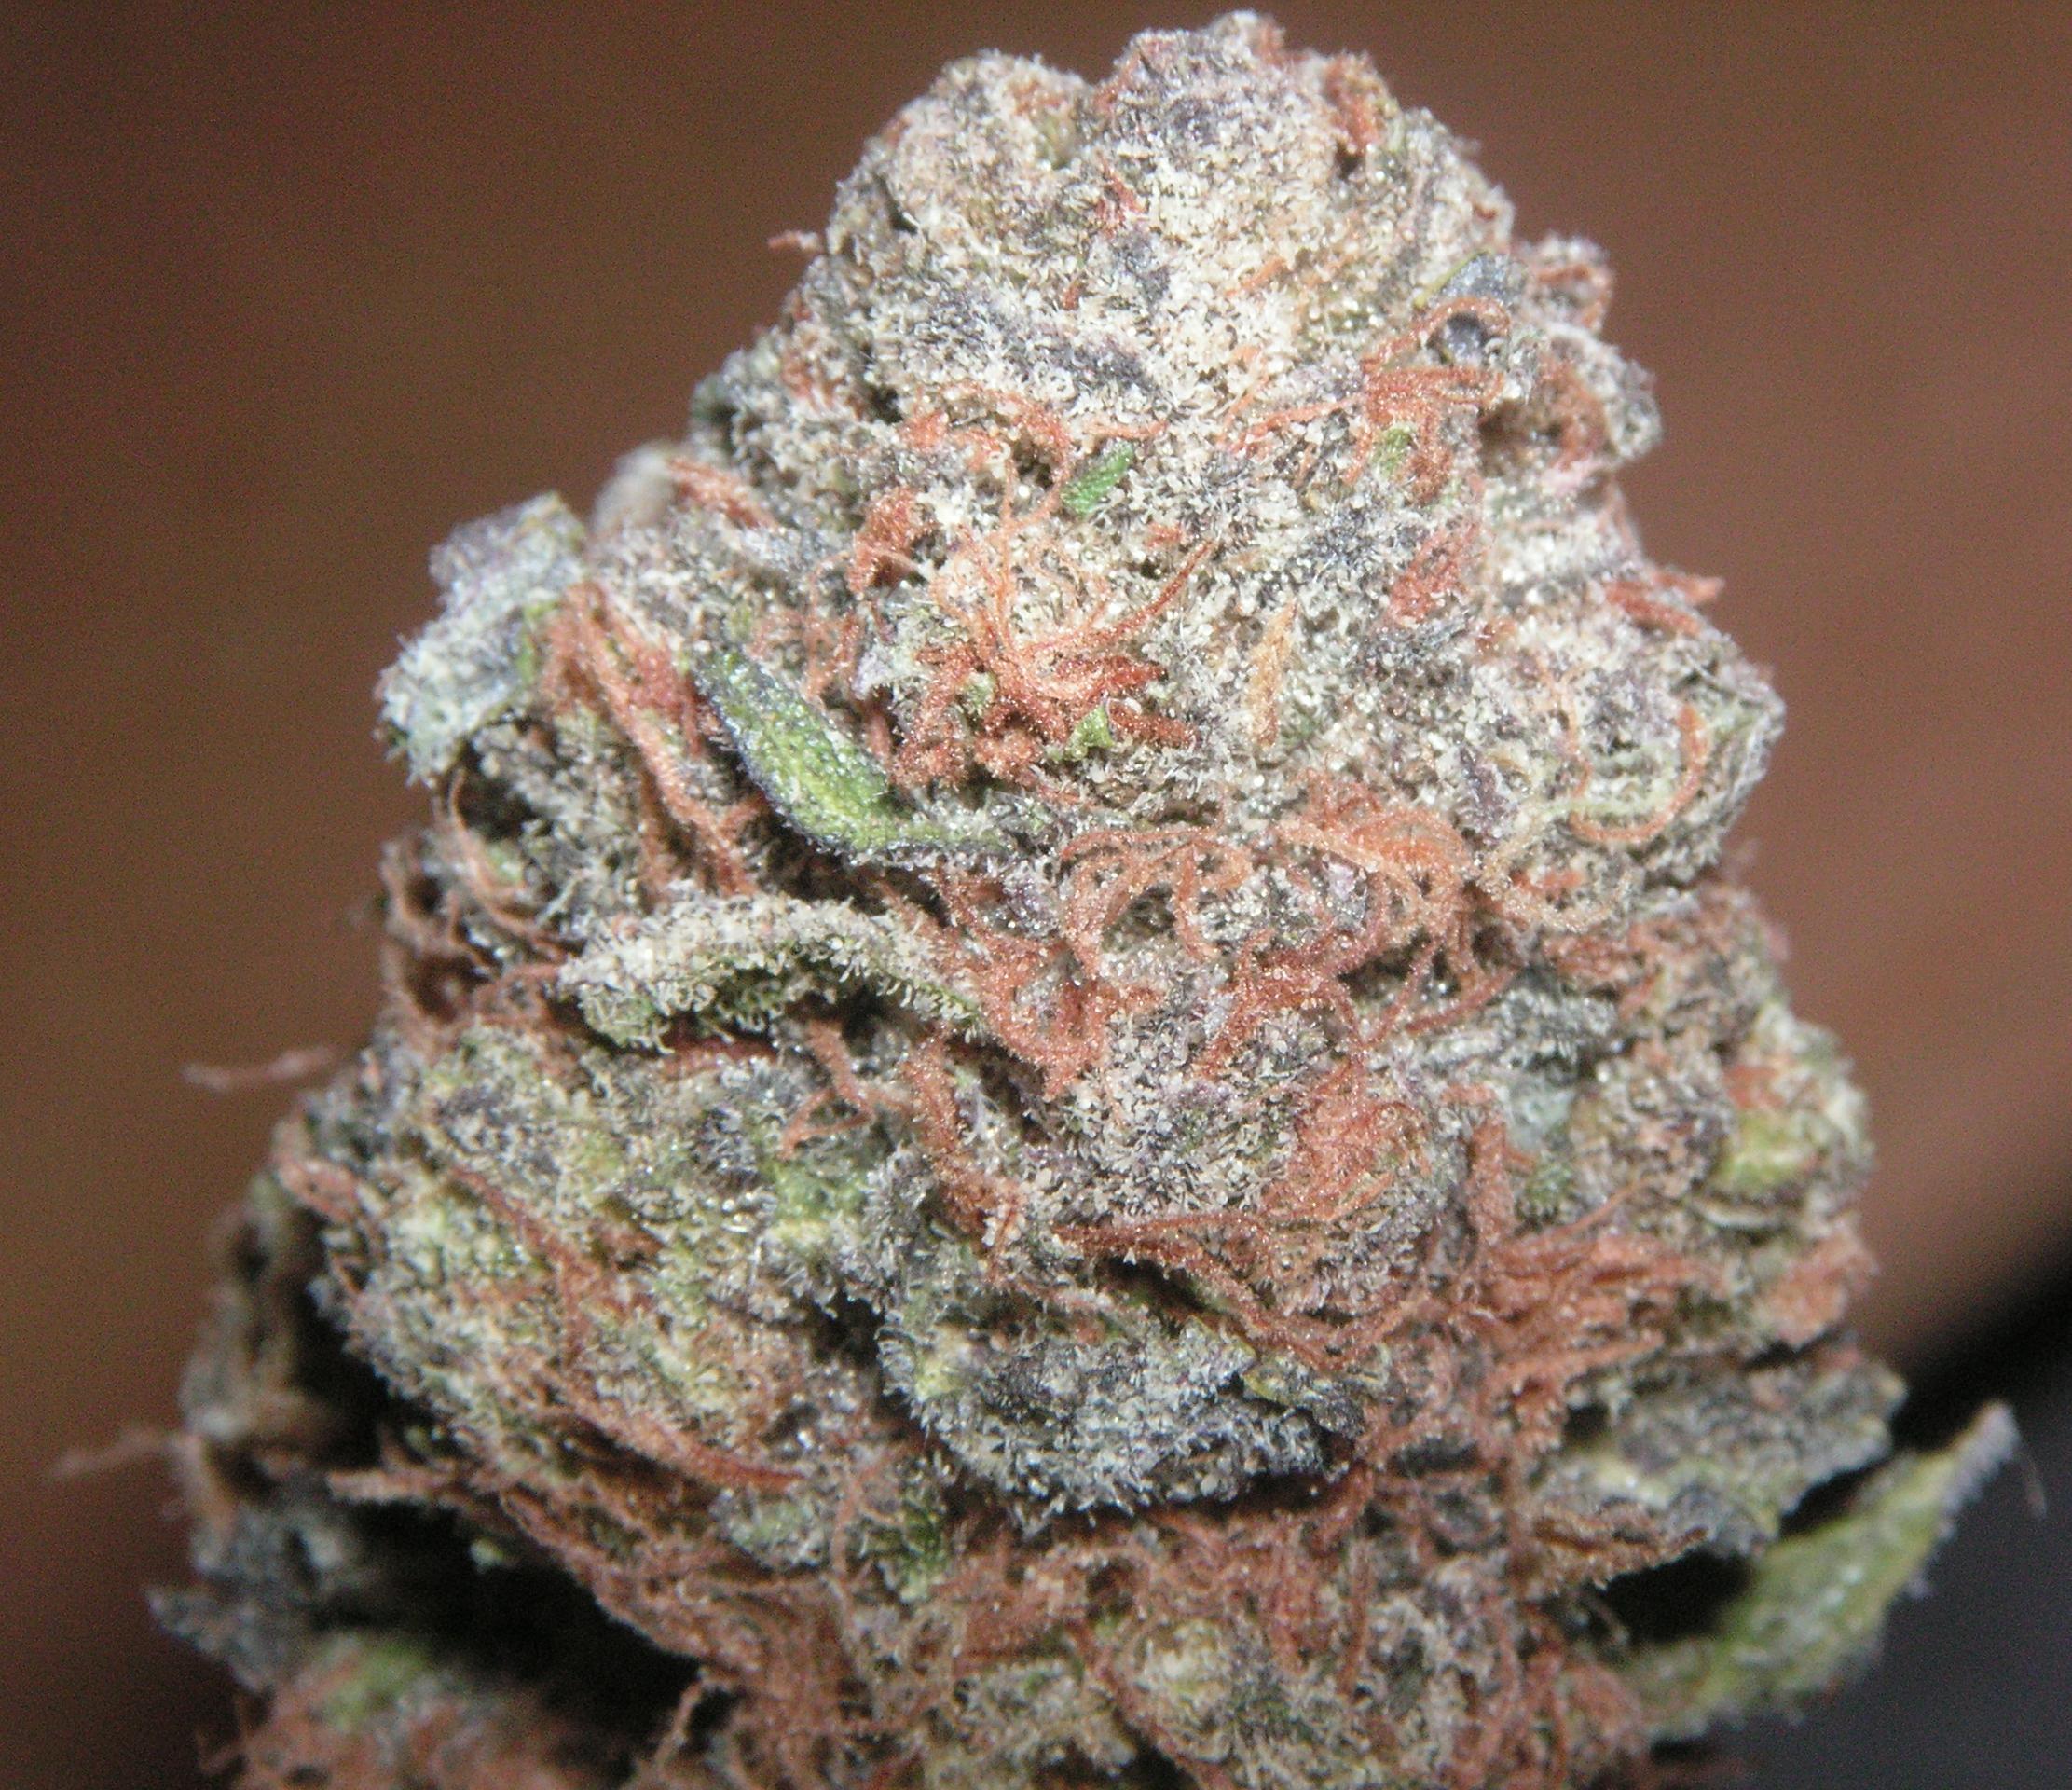 Cannabis strains - Wikipedia